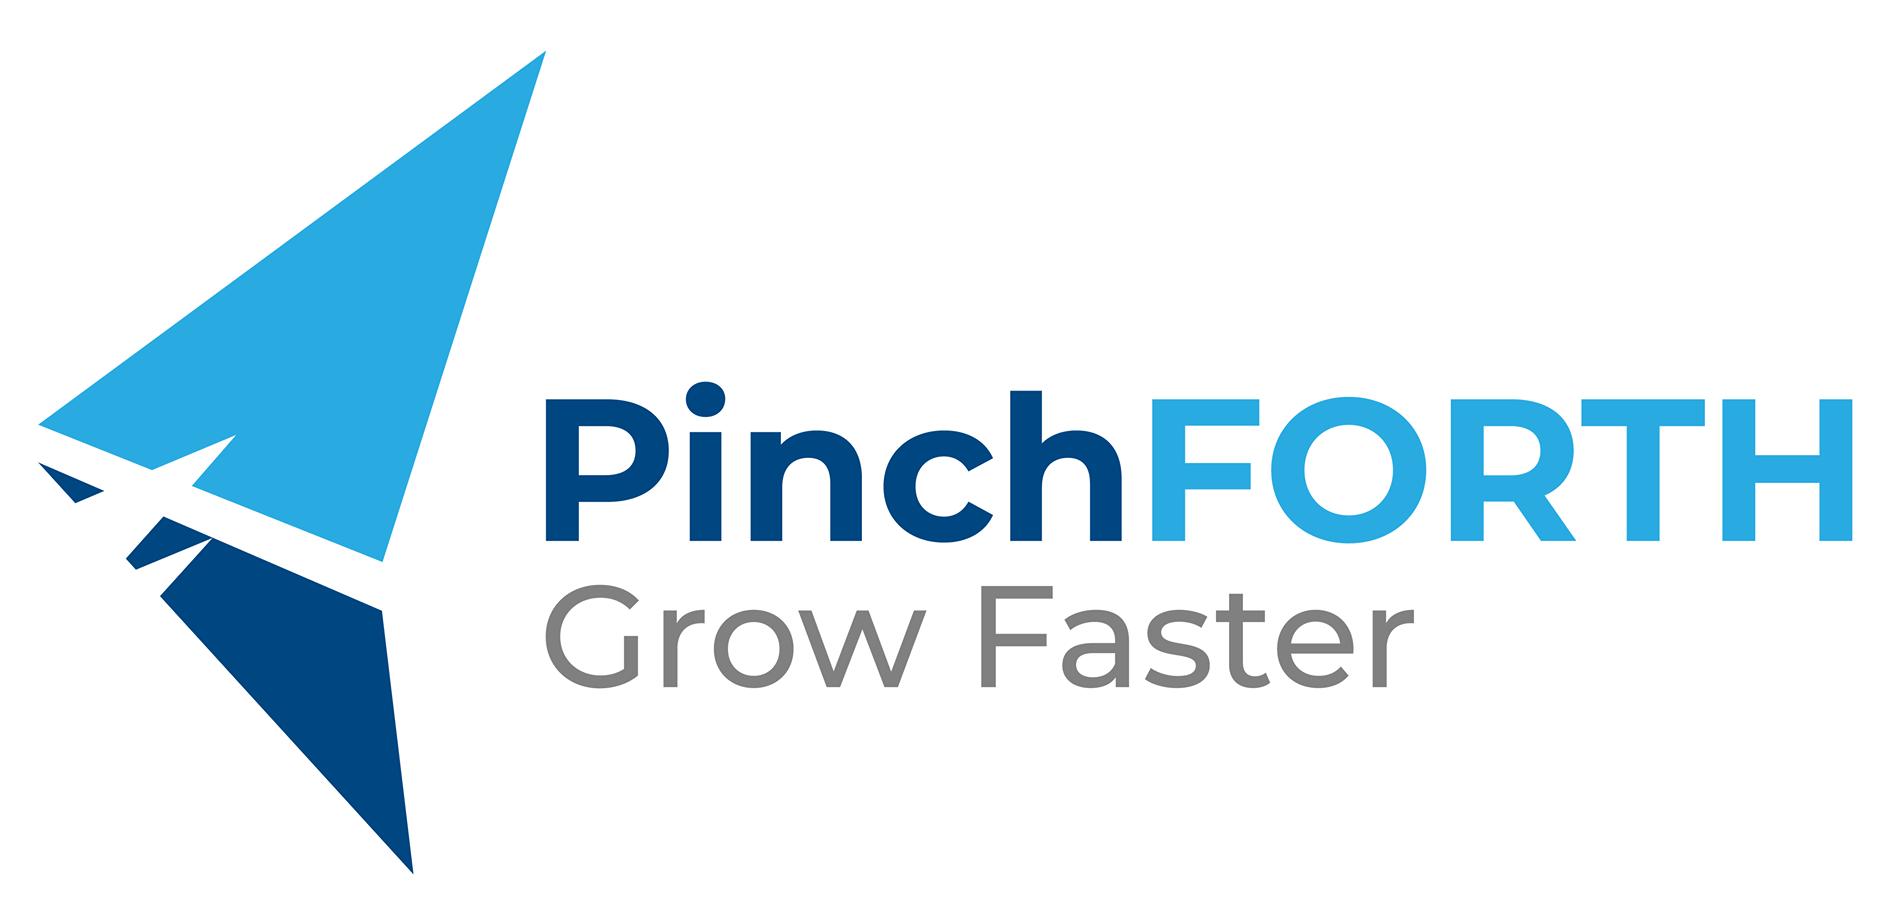 Pinchforth